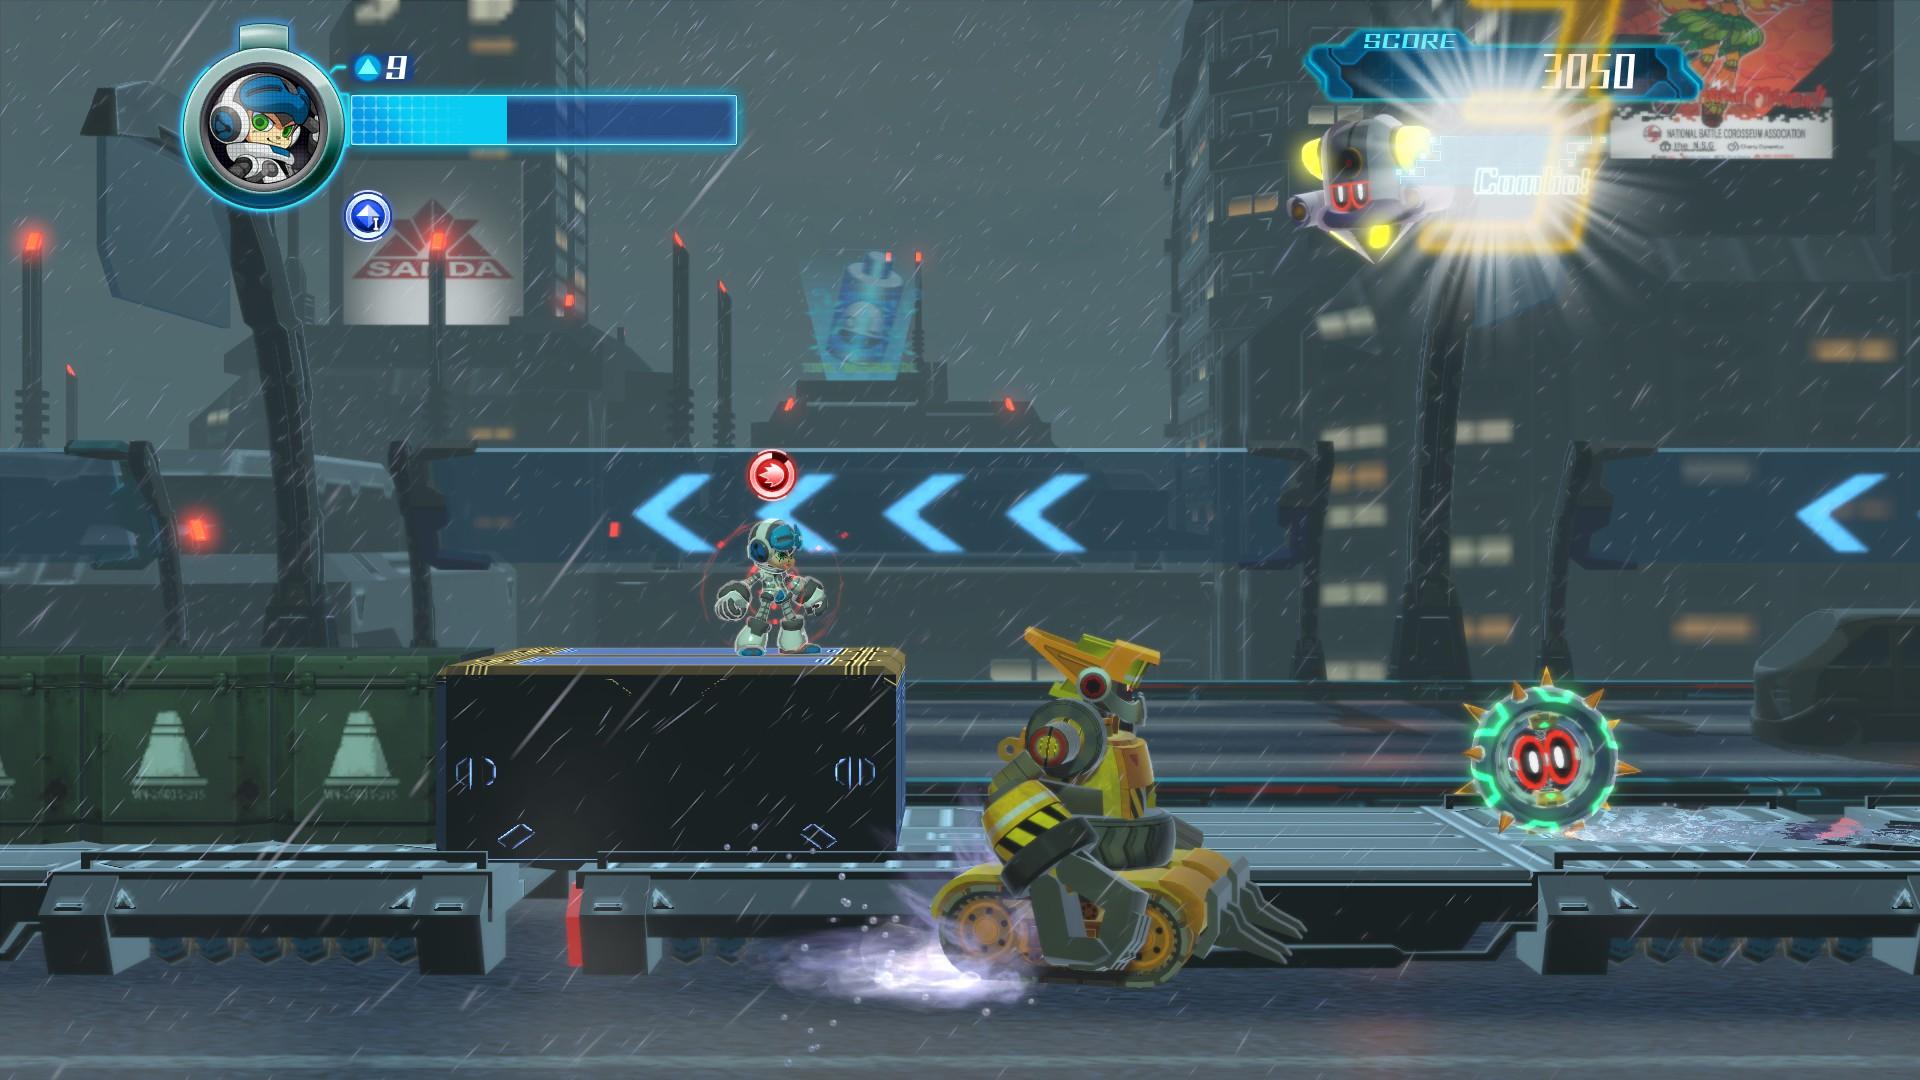 mighty-no-9-pc-screenshot-01